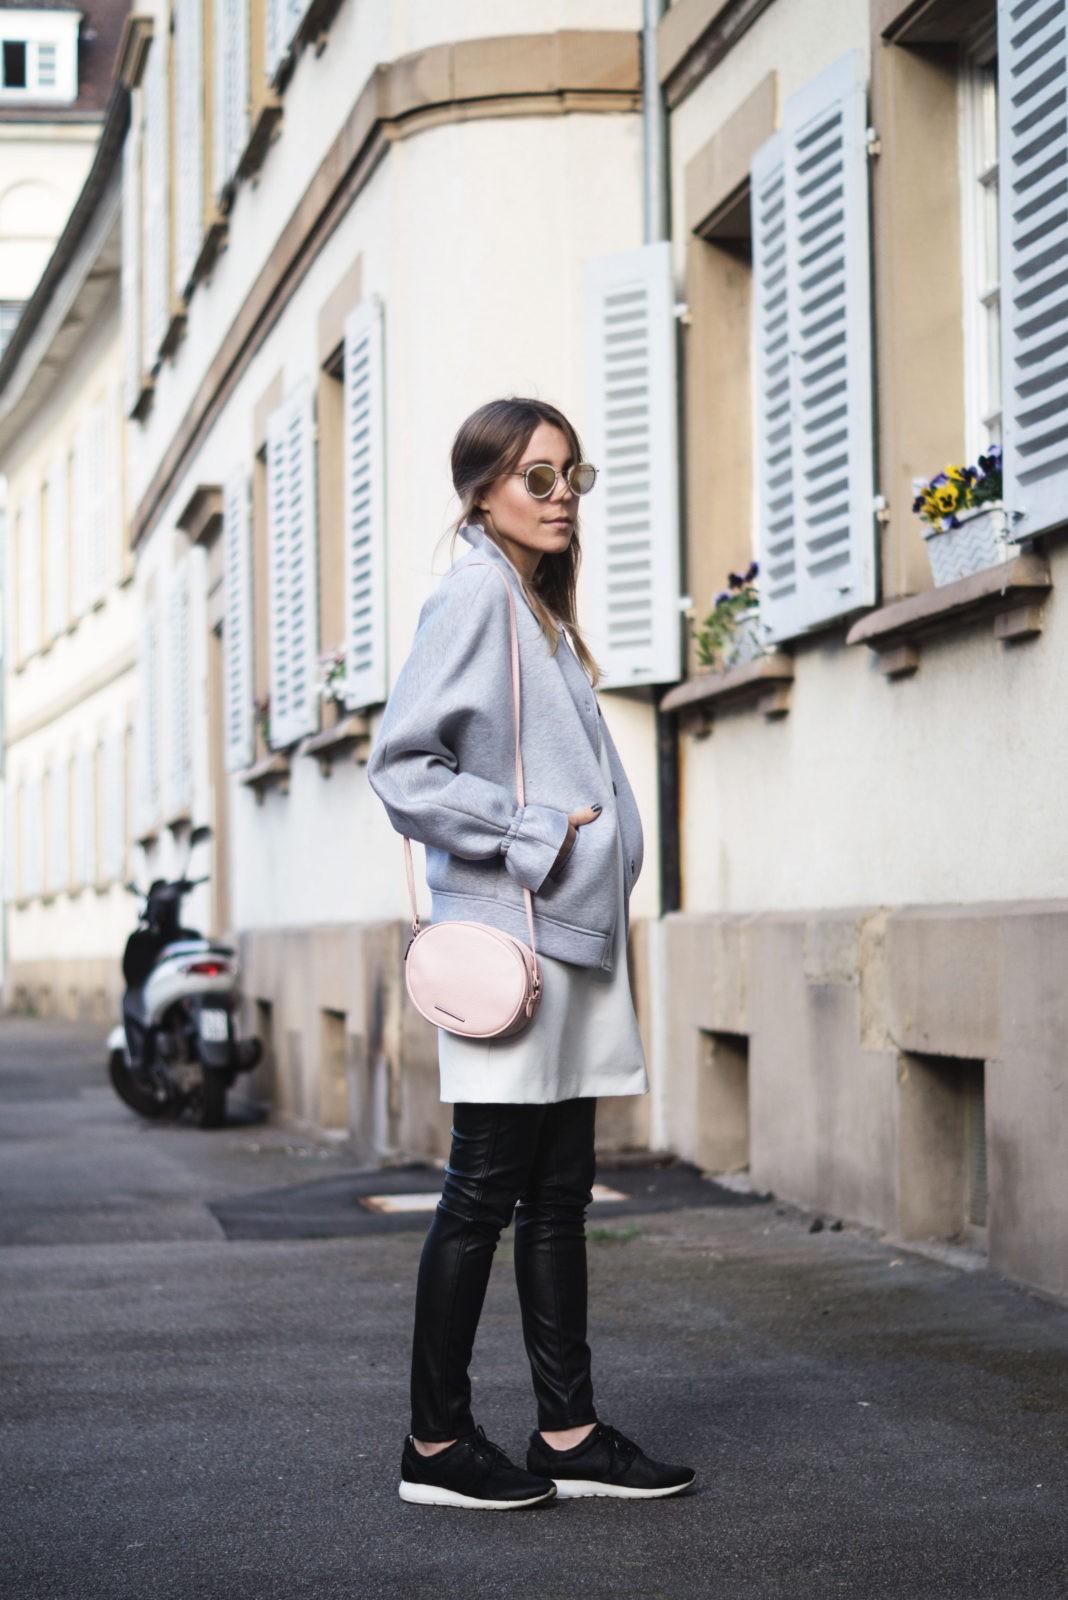 Gray-Bomber-Jacket-Bomberjacke-Grau-Rueschen-Rosa-Modeblog-Heidelberg-Fashionblogger-Casual-Outfit-Sariety-001